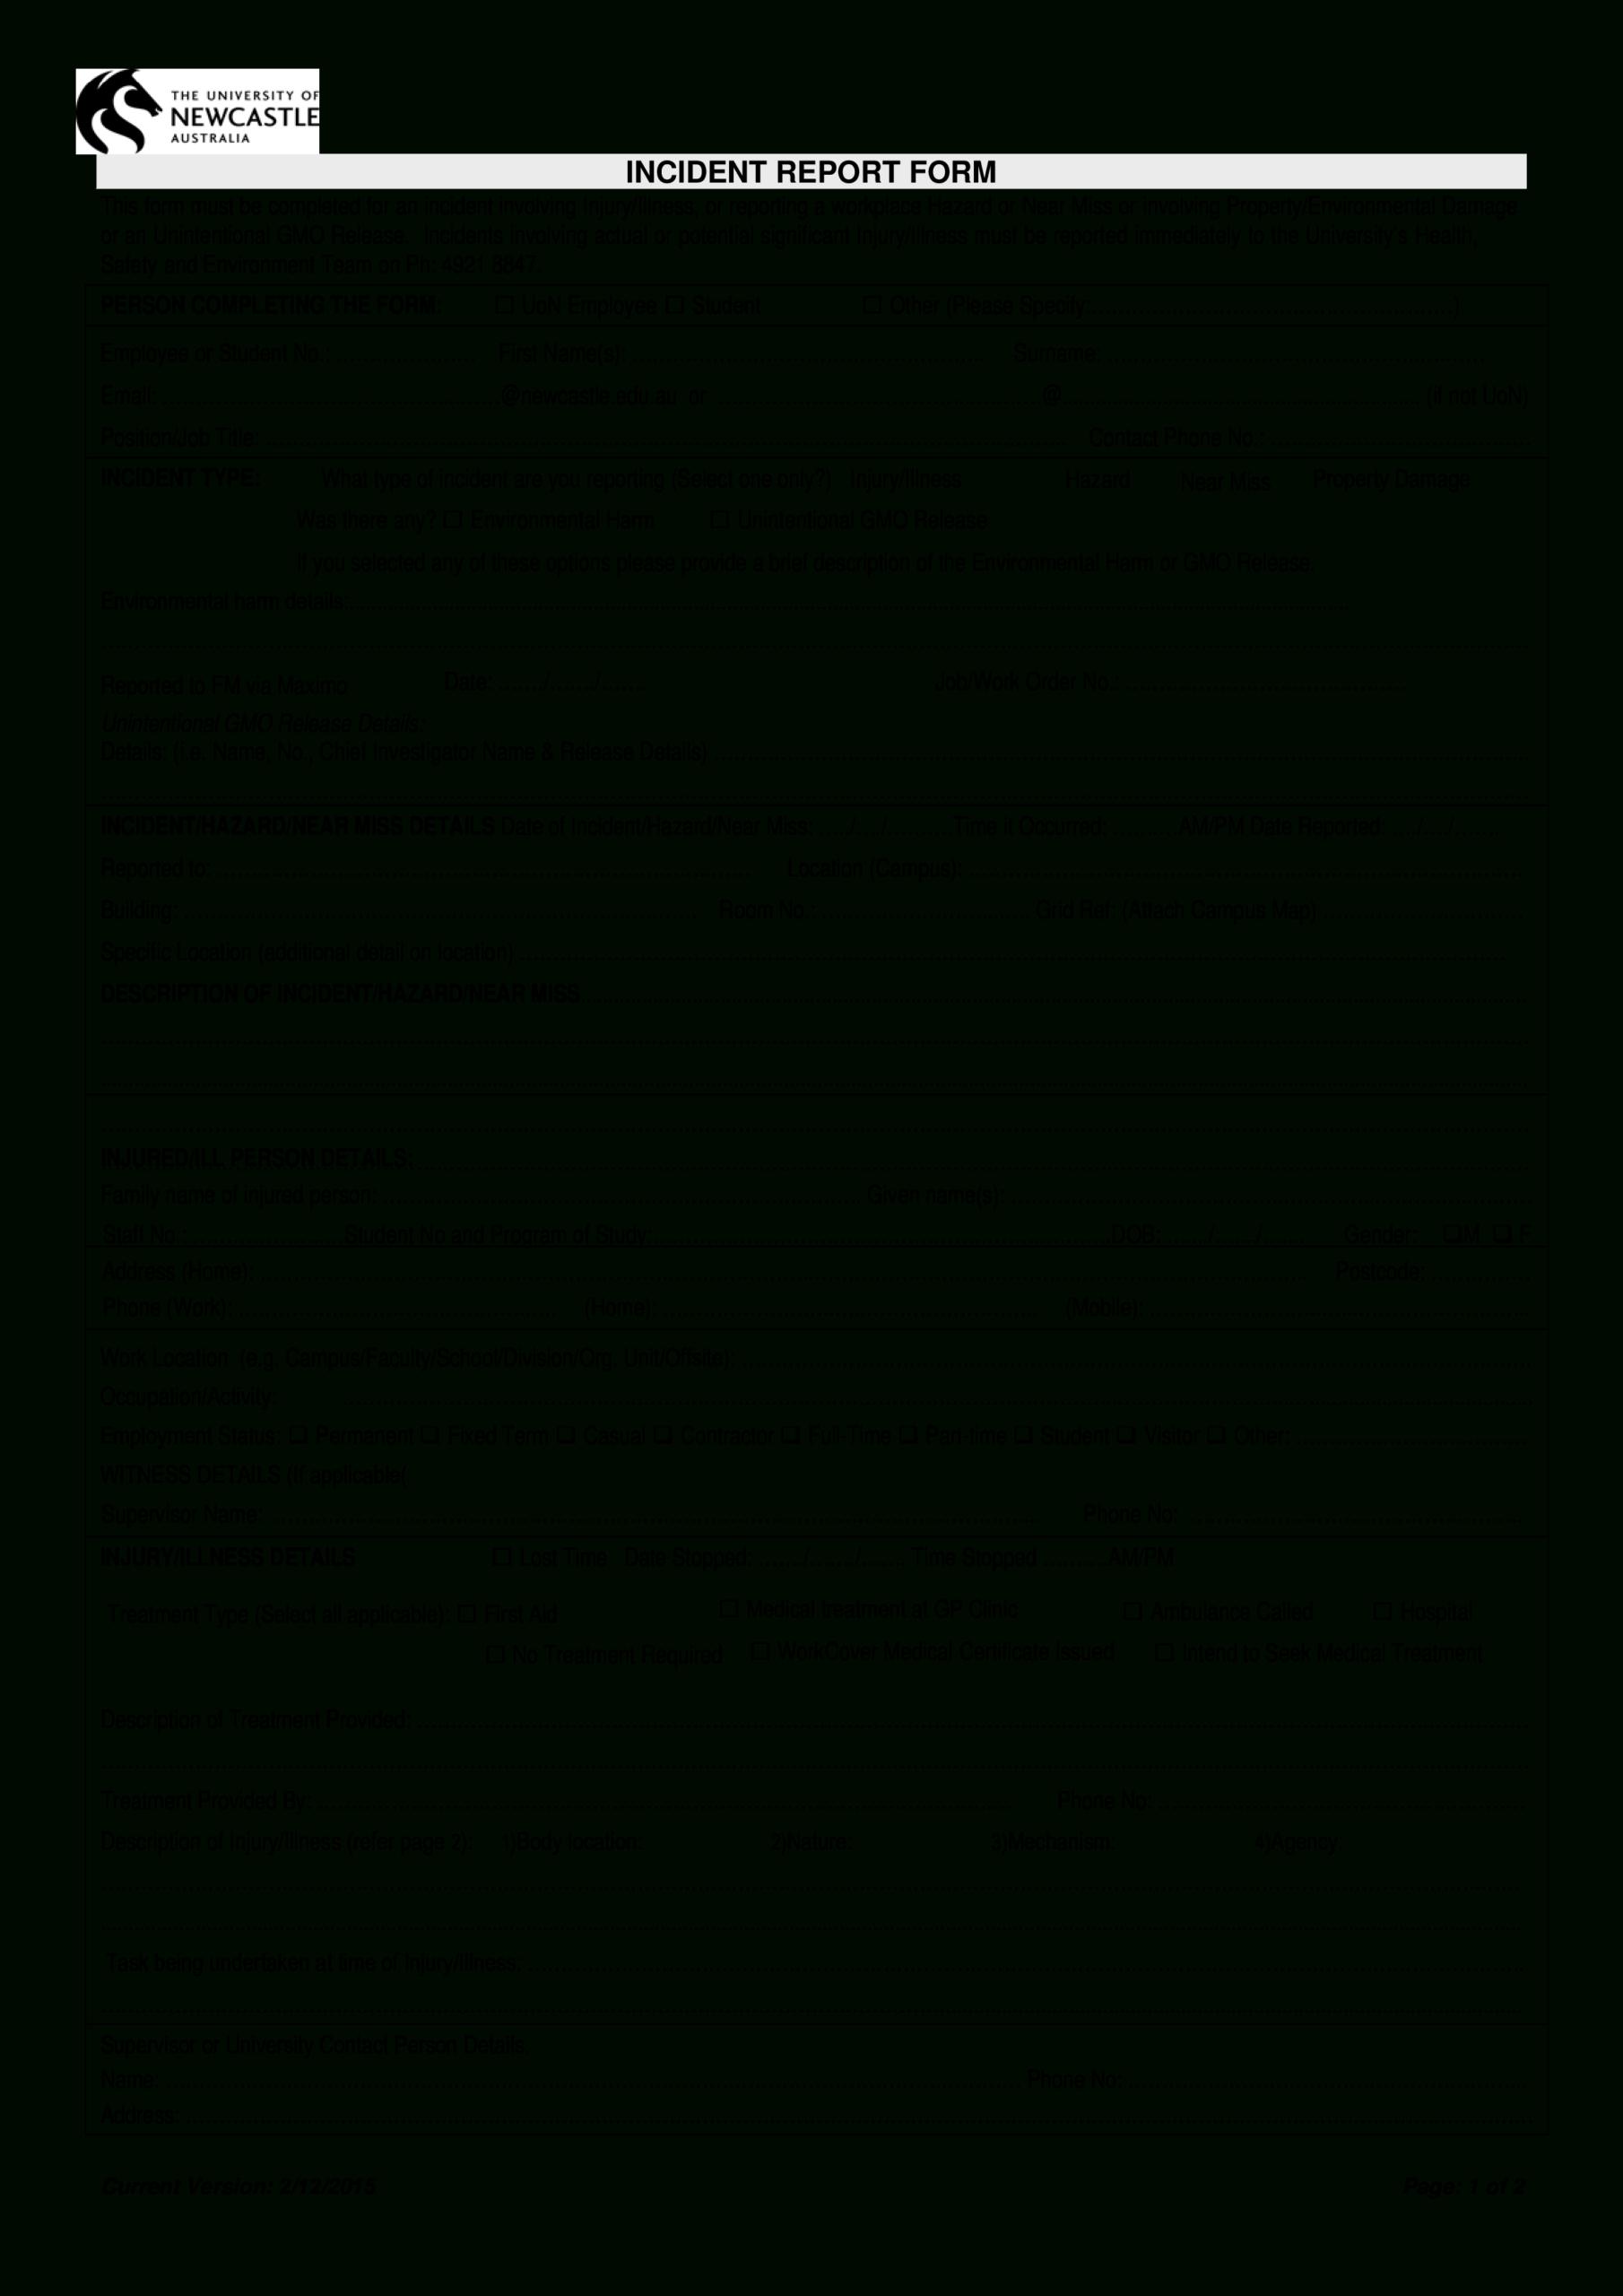 Hazard Incident Report Form | Templates At Inside Hazard Incident Report Form Template